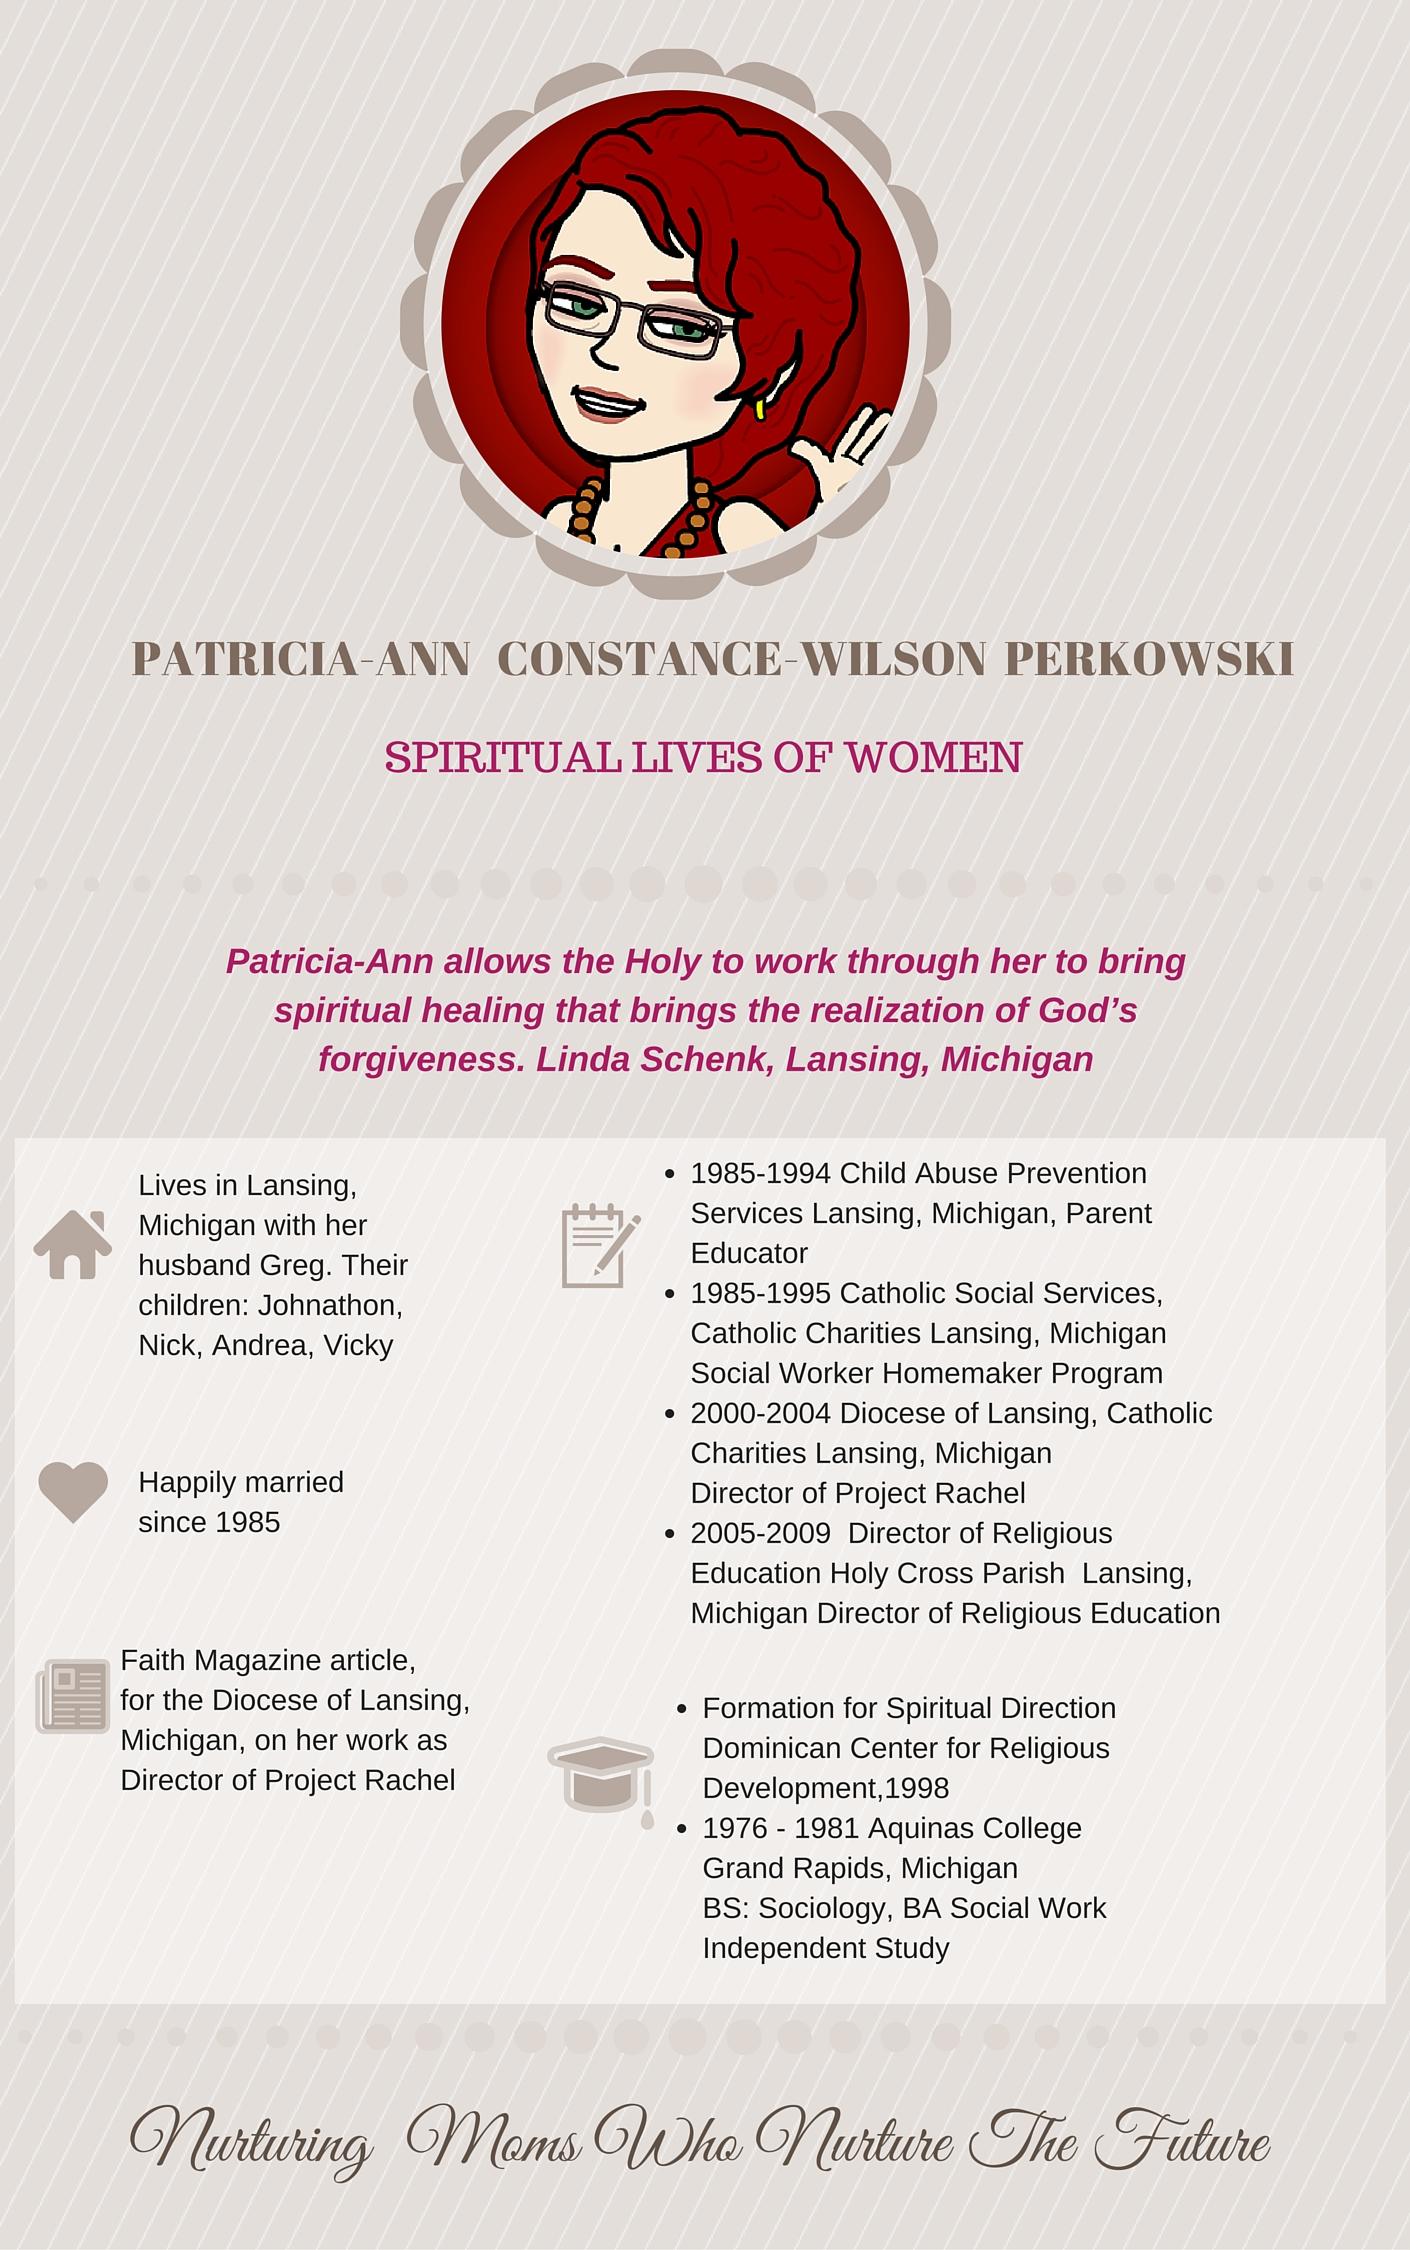 PATRICIA-ANN CONSTANCE-WILSON PERKOWSKI (2)